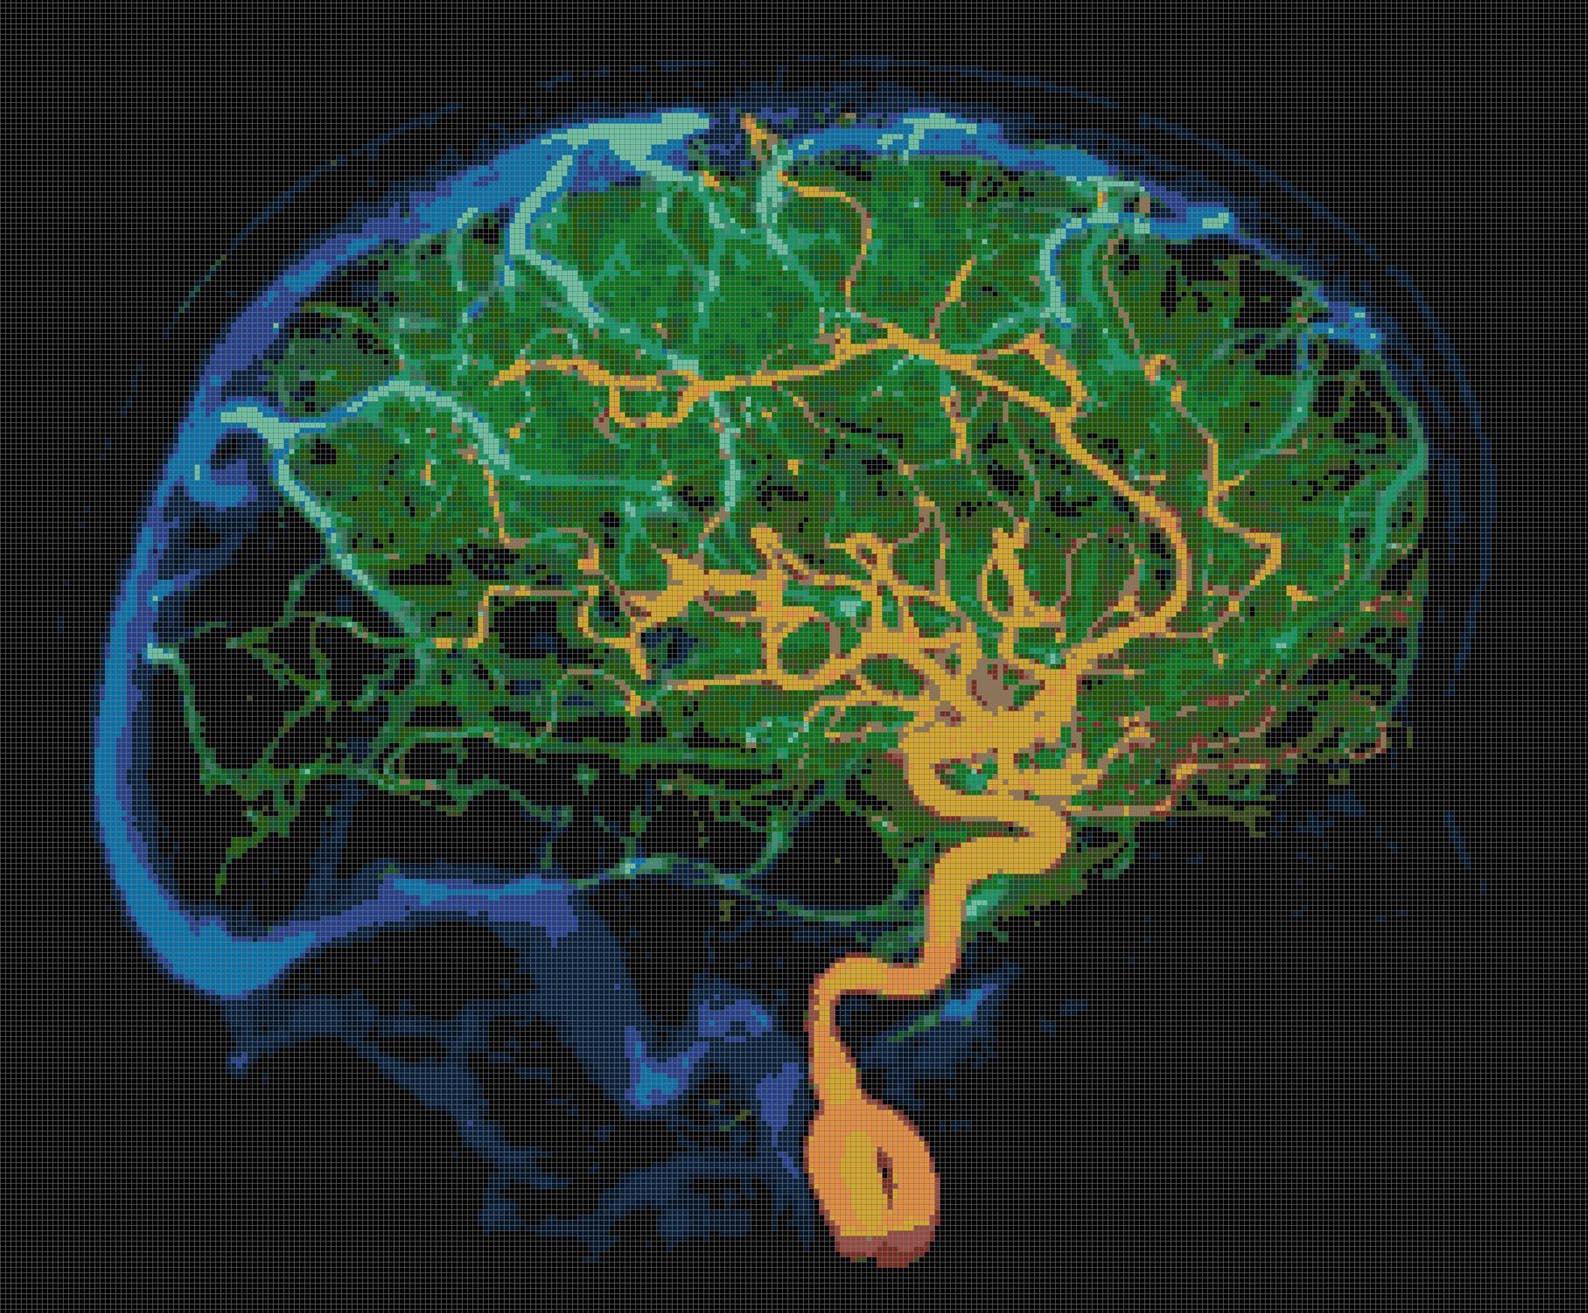 Brain Blood Vessels Cross-Stitch Pattern https://www.etsy.com/listing/210943795/brain-blood-vessels-pdf-handmade-cross?ref=shop_home_active_1